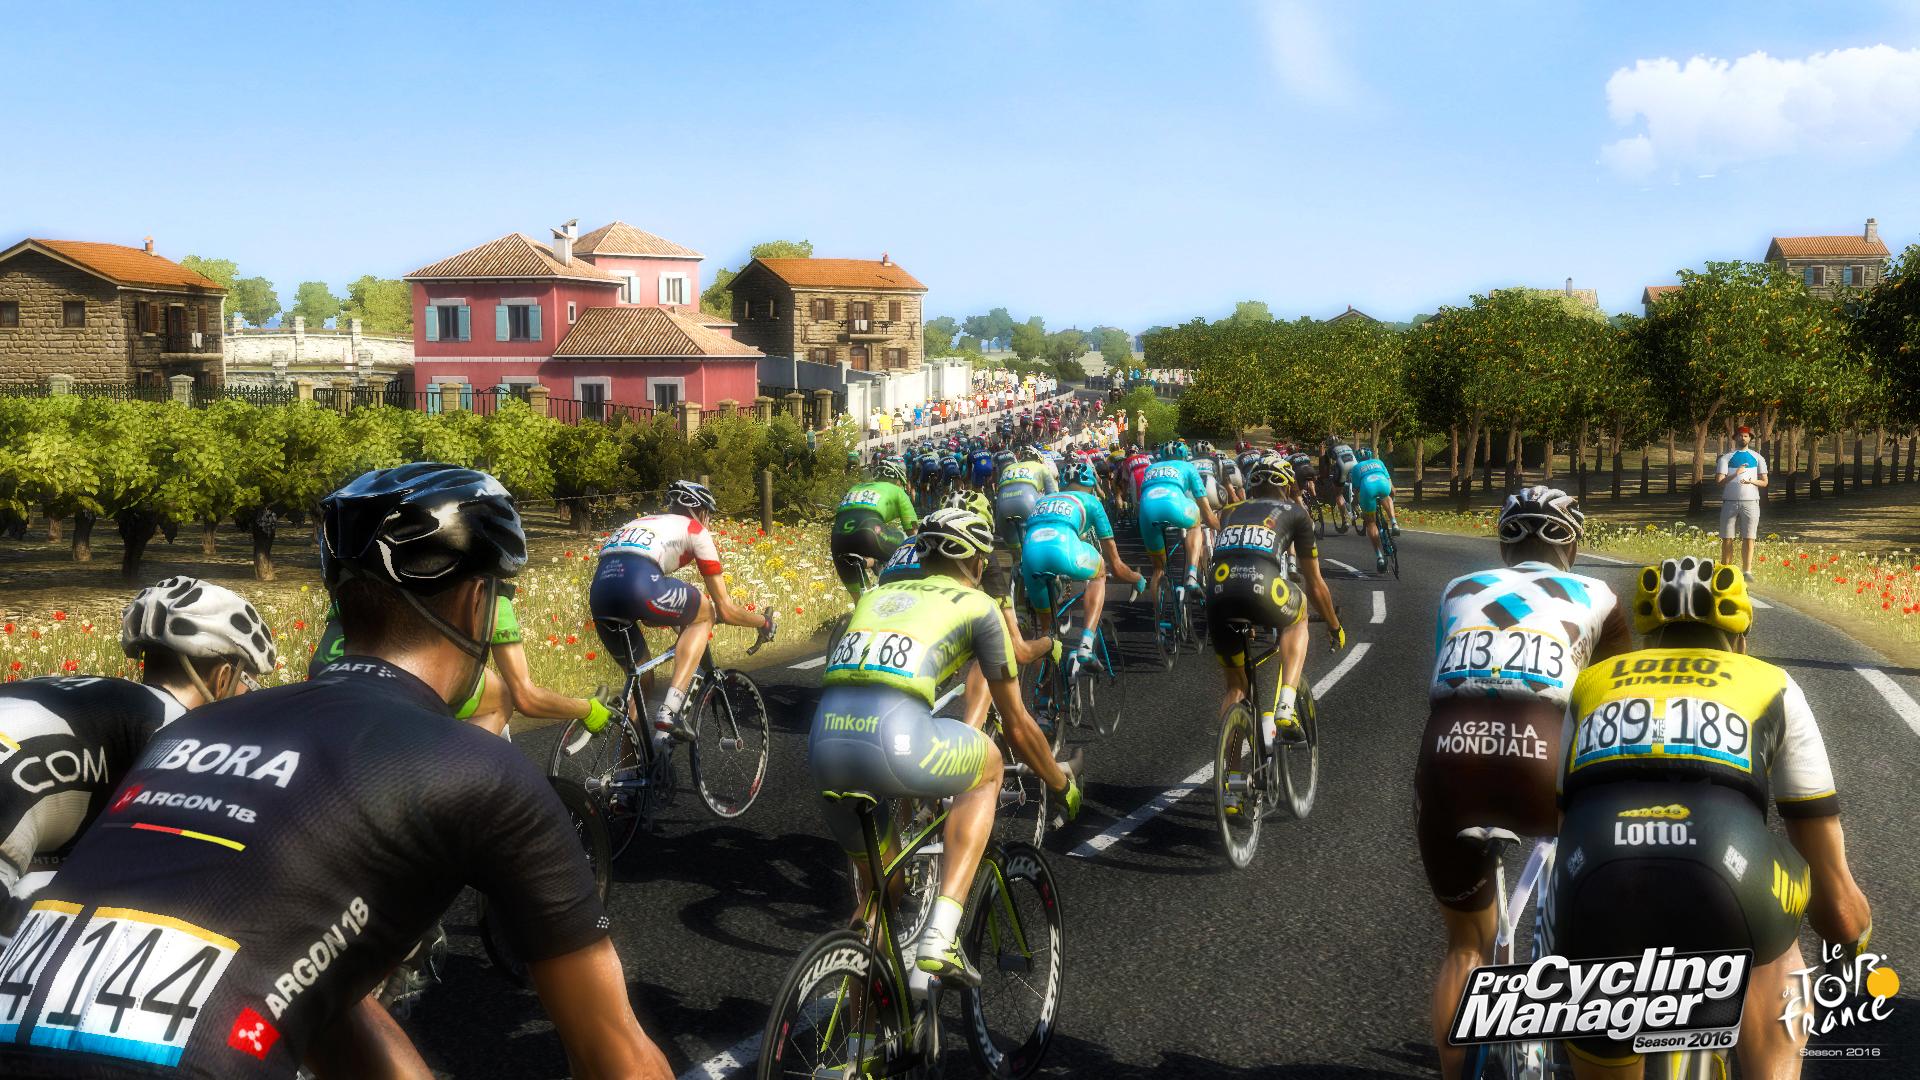 Pro Cycling Manager 2016 ESPAÑOL PC Descargar Full (SKIDROW) + REPACK 1 DVD5 (JPW) 1